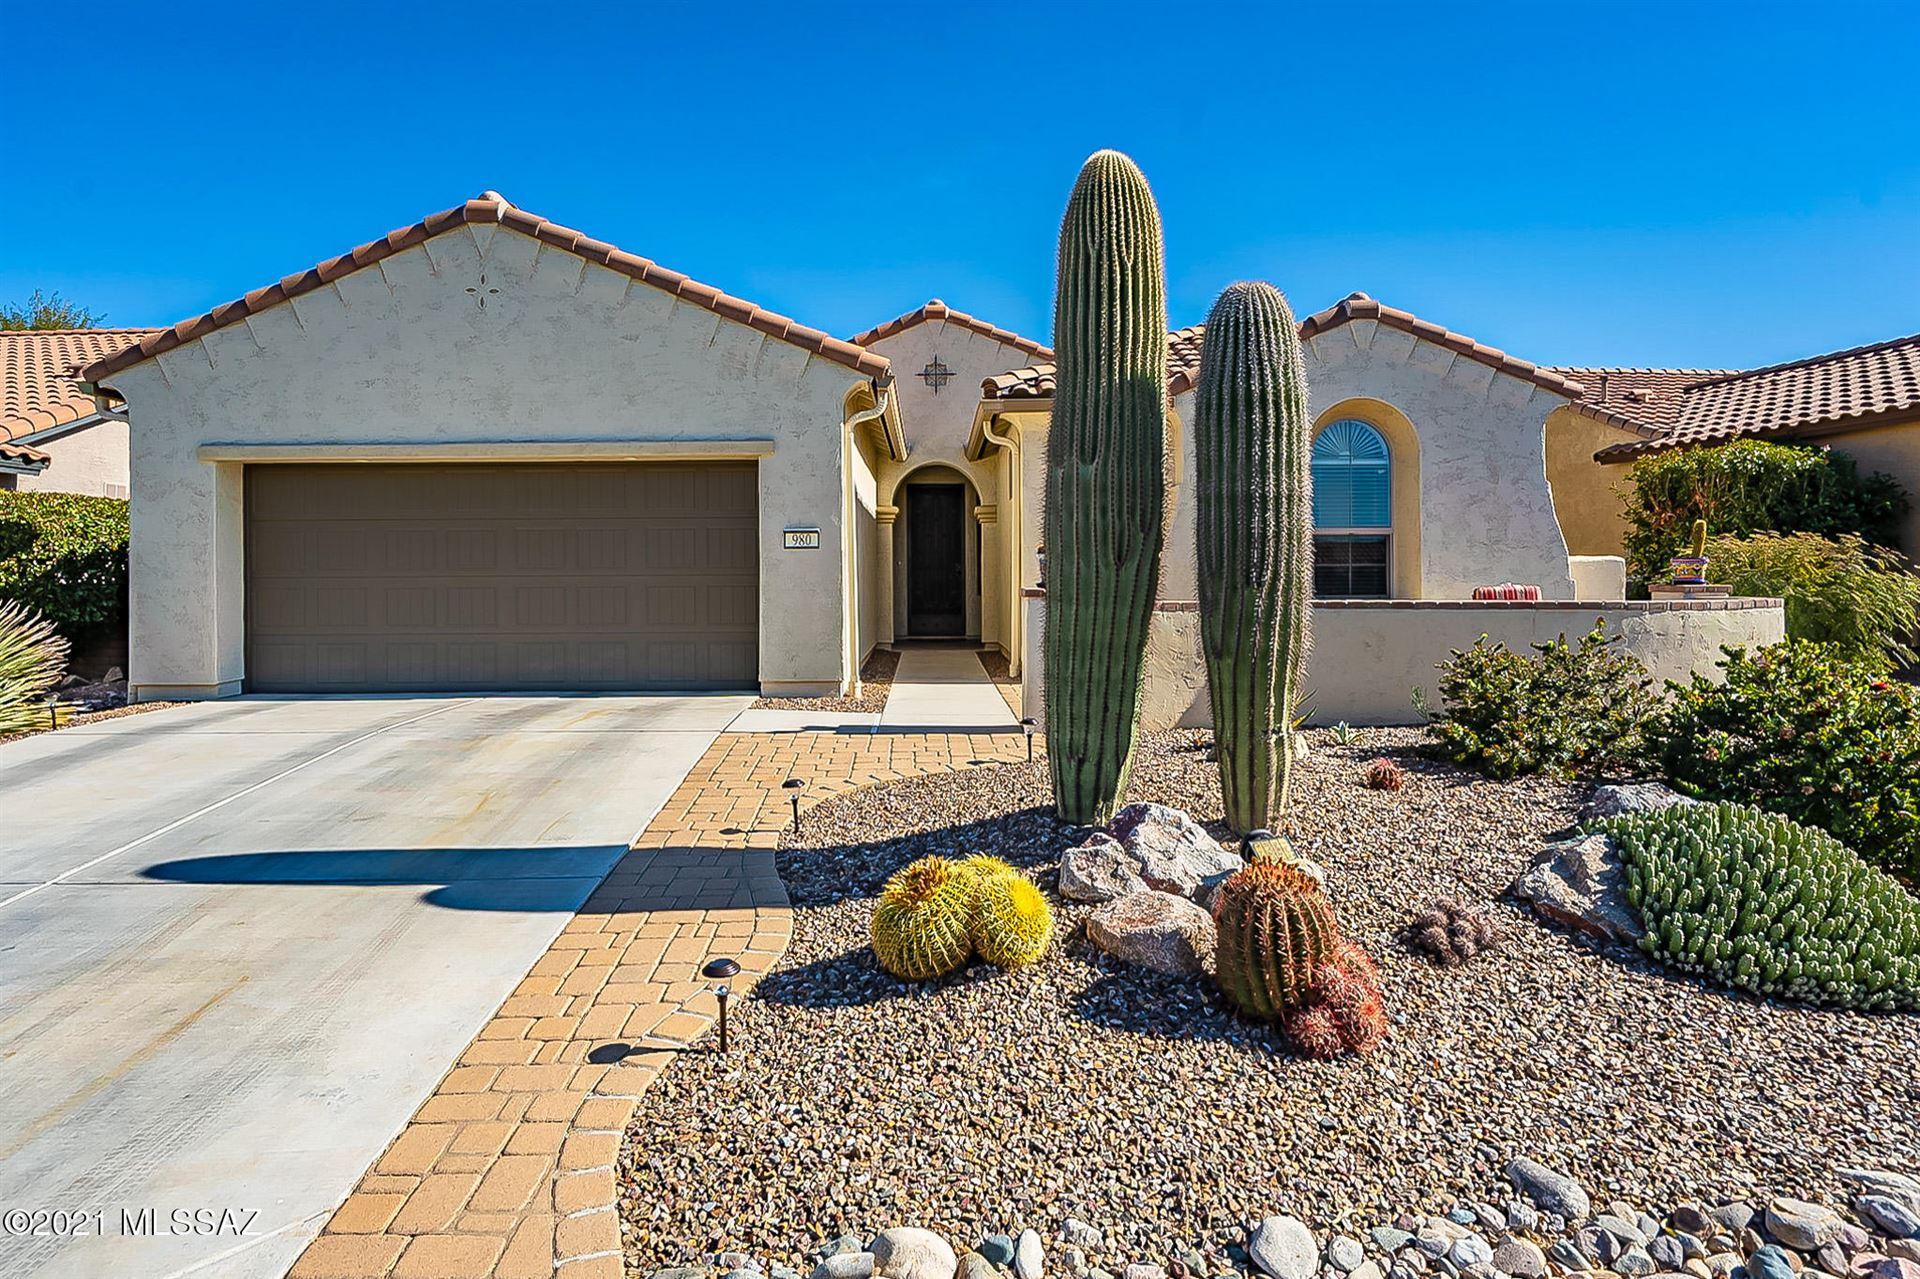 980 N Turquoise Vista Dr, Green Valley, AZ 85614 - MLS#: 22101318